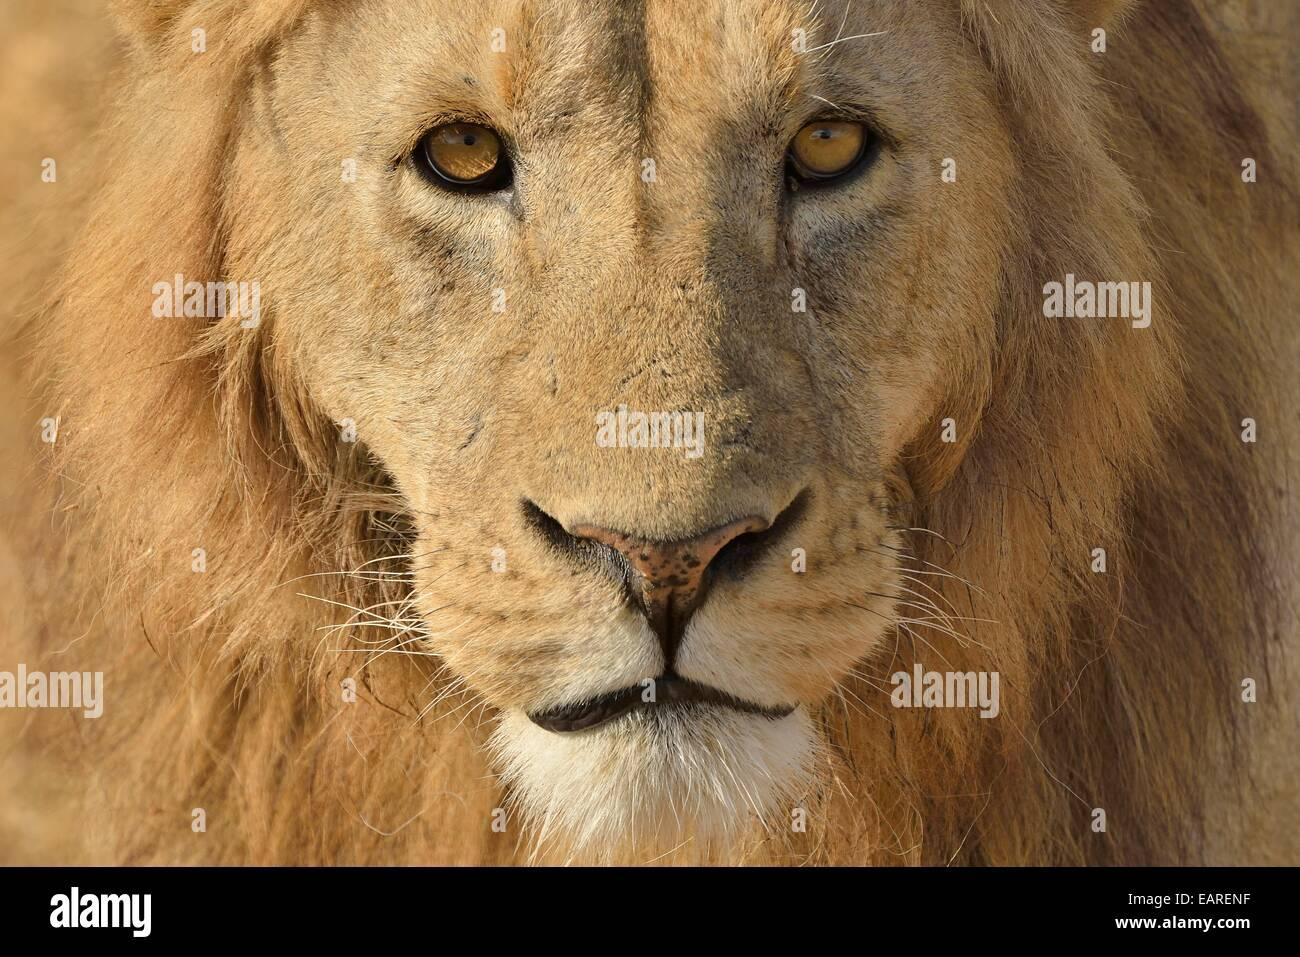 Lion (Panthera leo), avec une crinière, portrait, Ngorongoro, Serengeti, Tanzanie Photo Stock